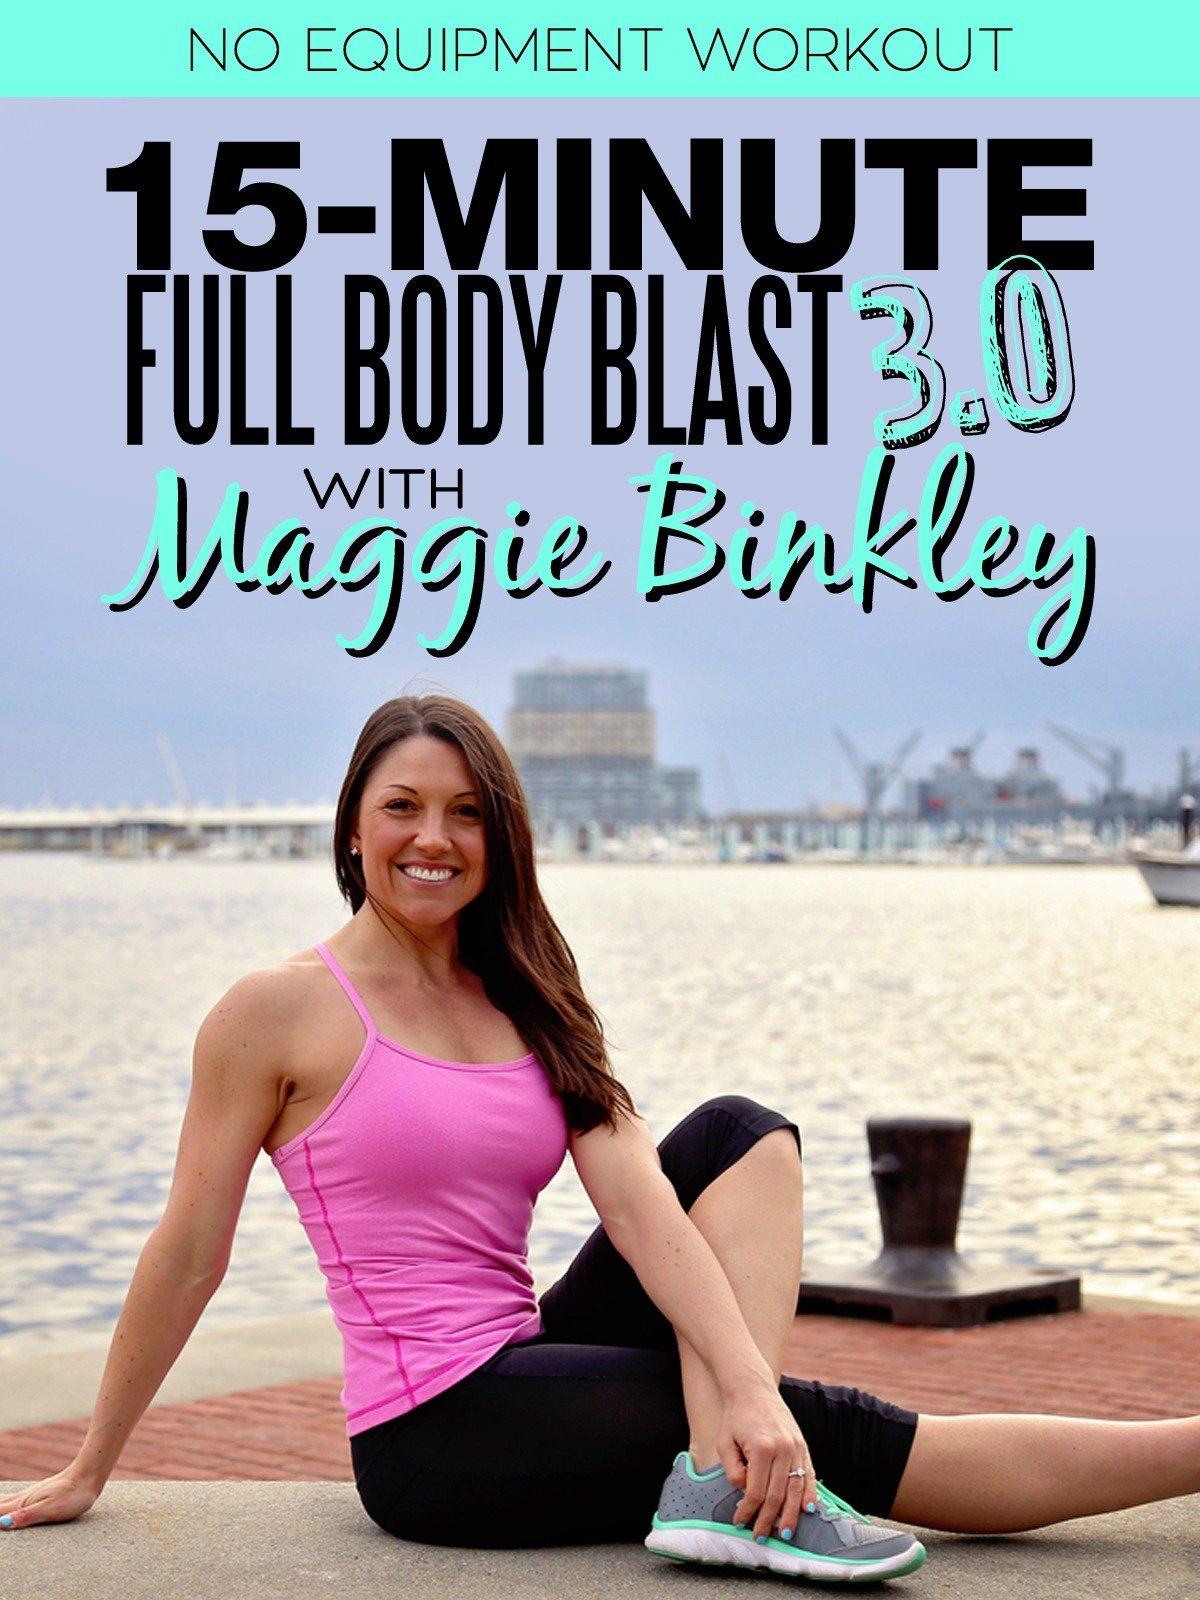 15-Minute Full Body Blast 3.0 Workout